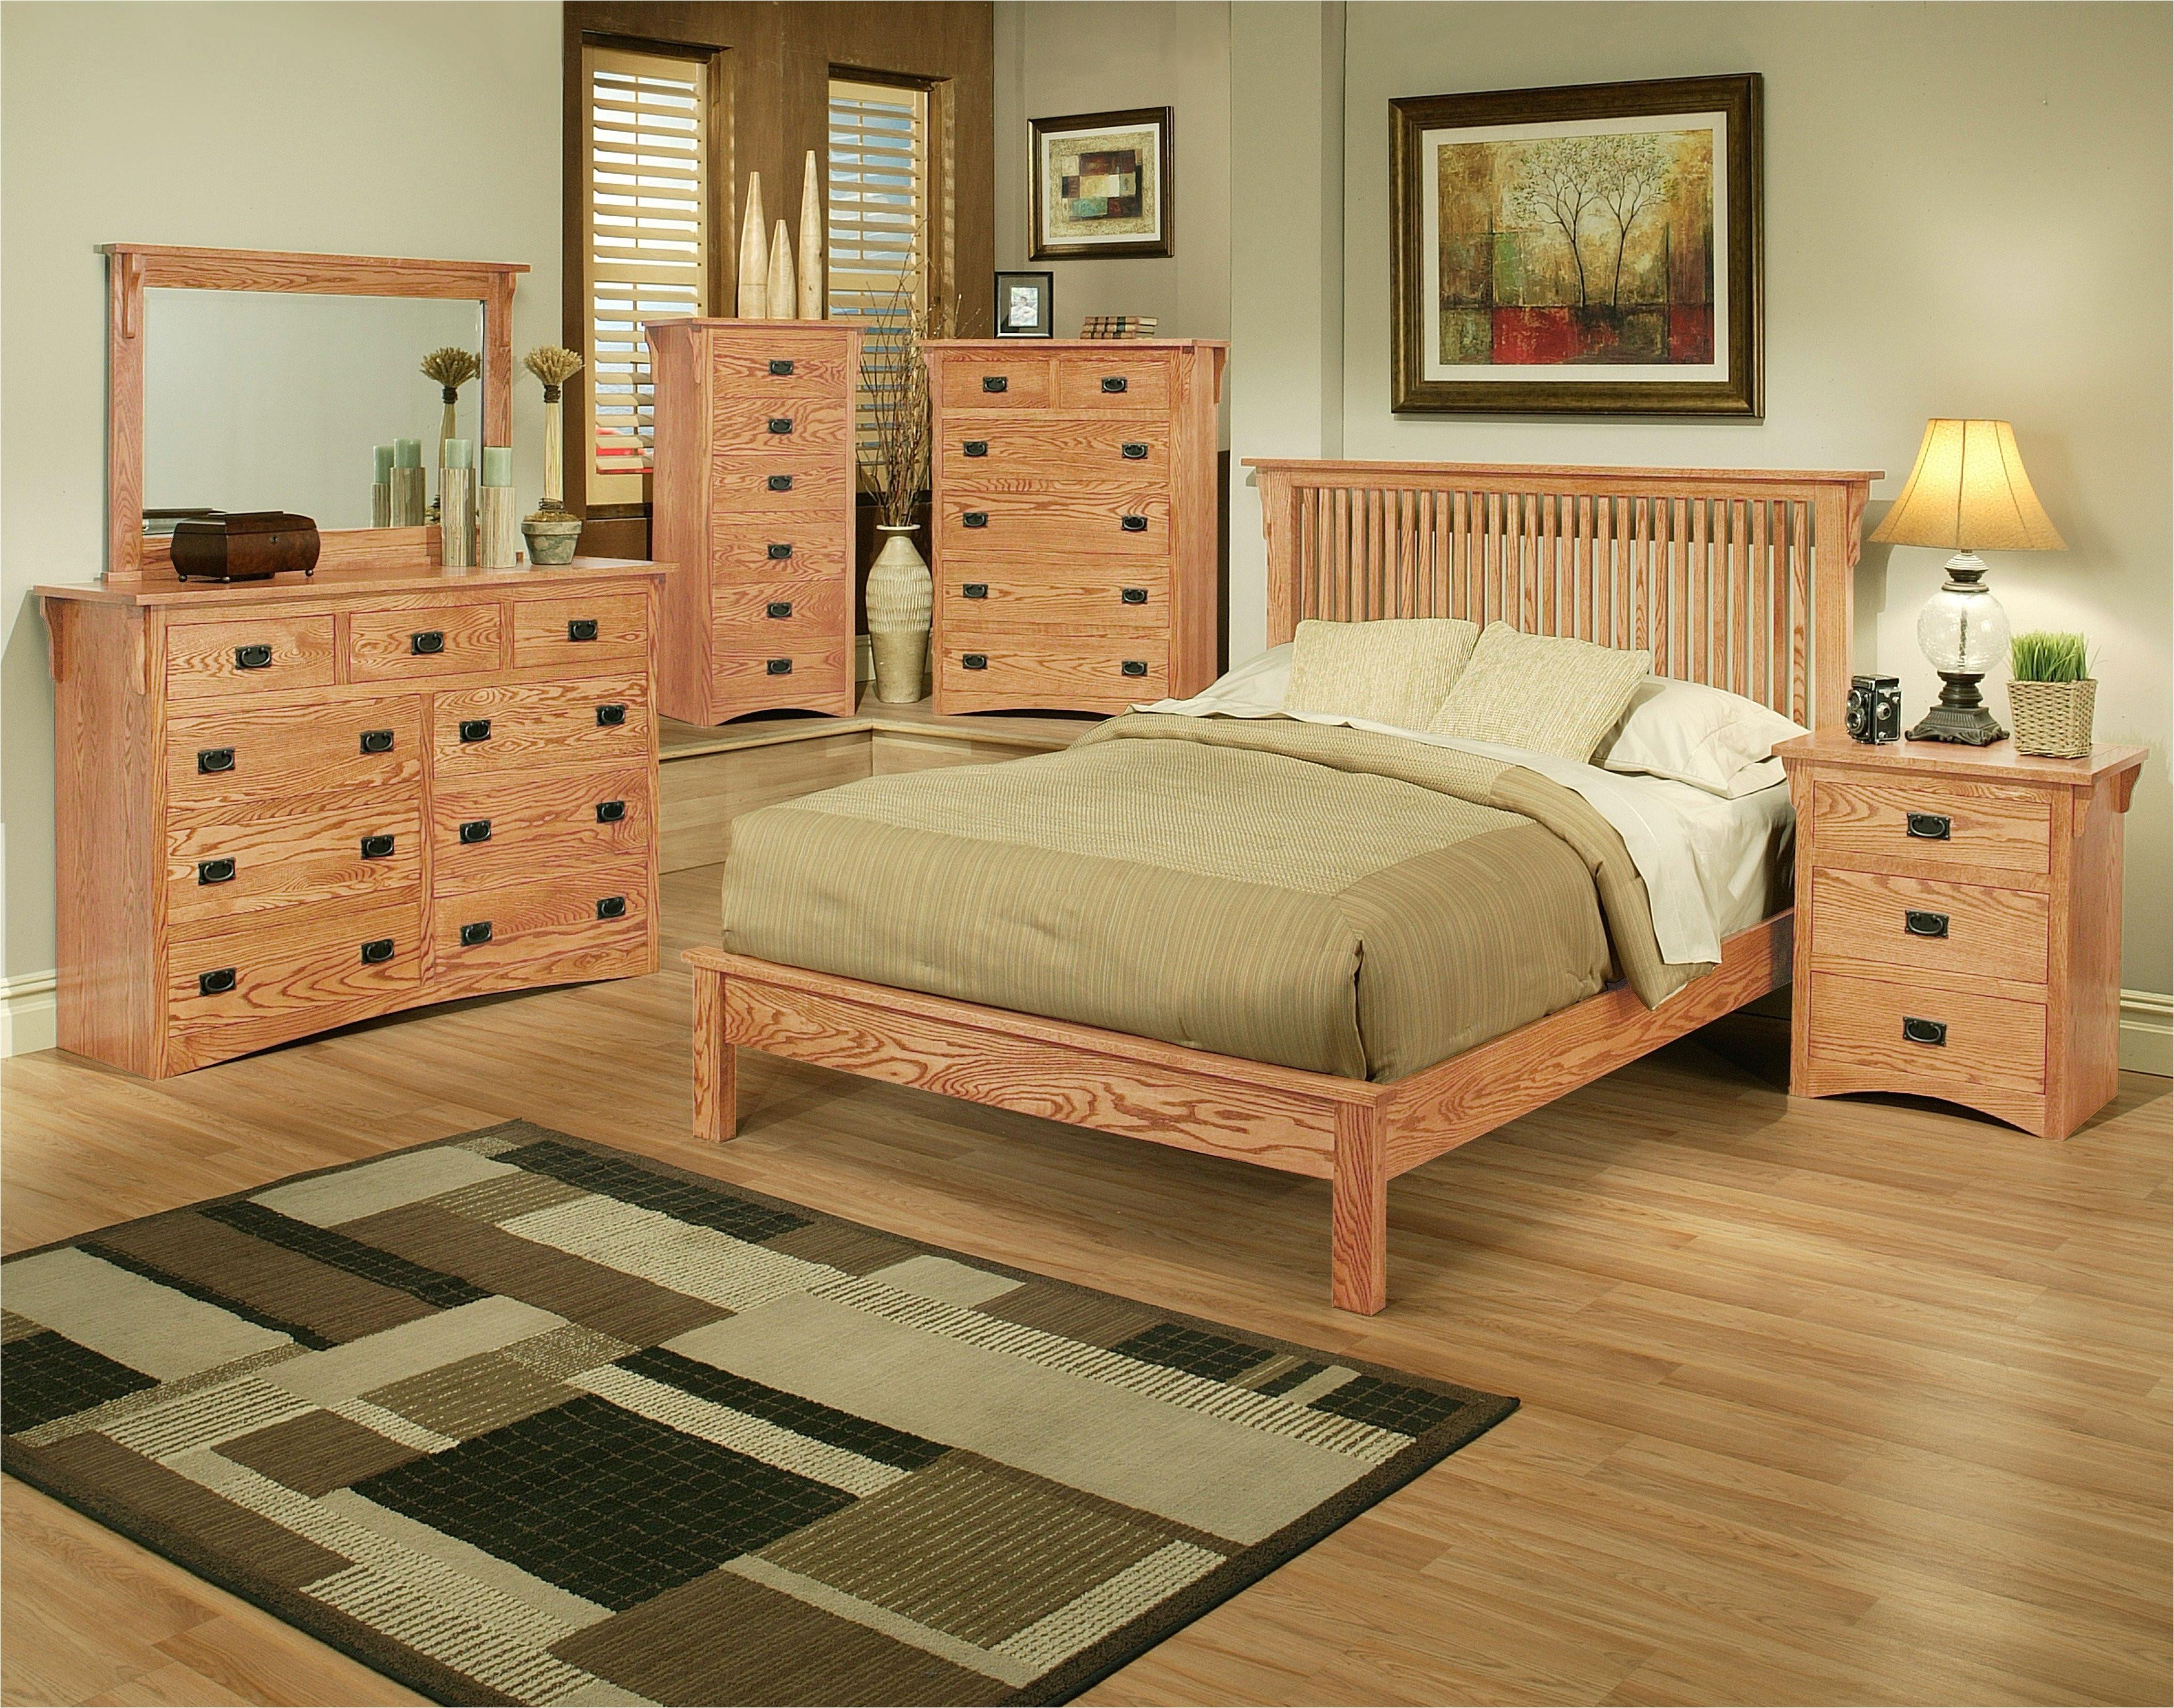 od rake bedroom suite hires light fb 3414 4846 833f c28cc7c74c96 a· king bedroom furniture beautiful